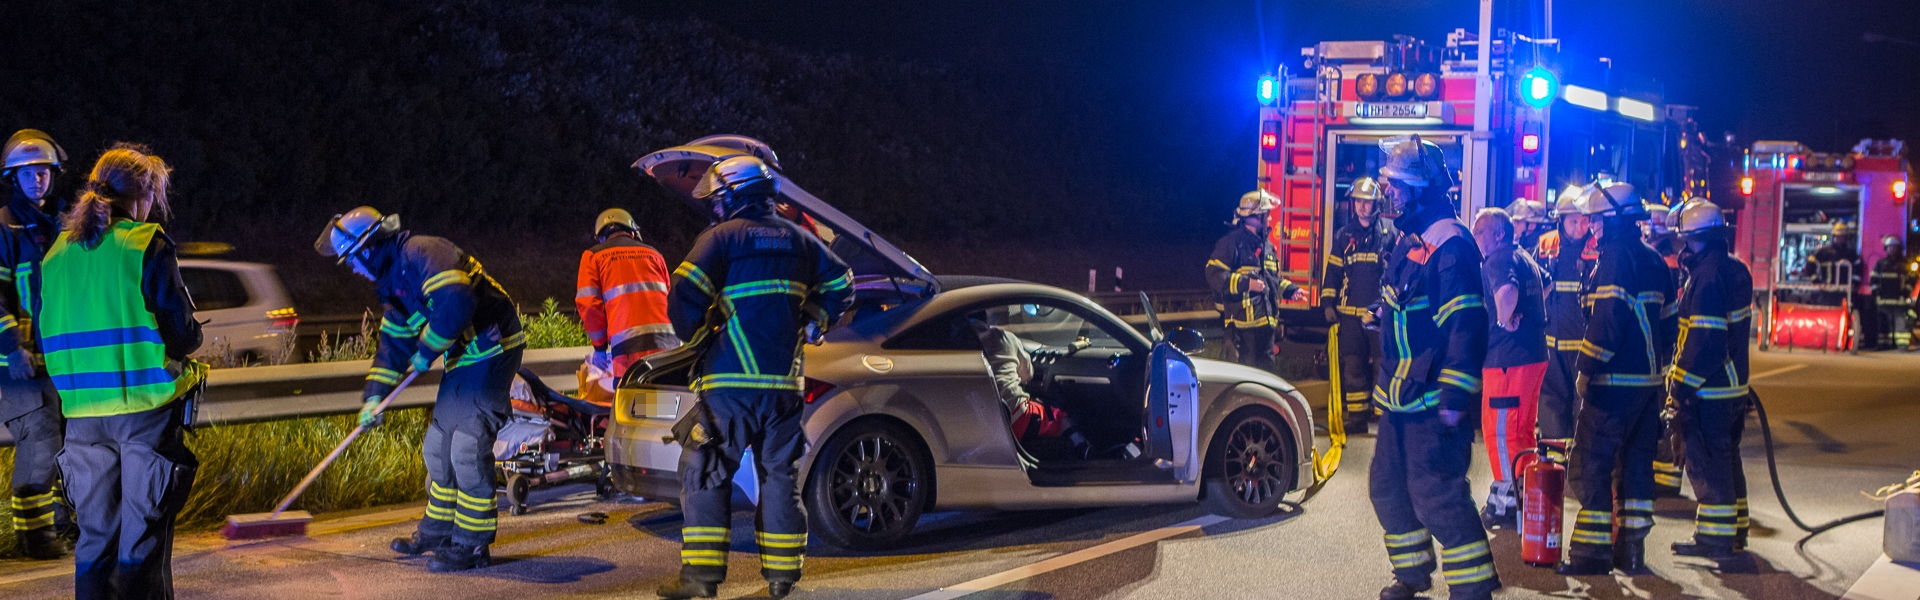 16.06.2017 – Audi rammt Leitplanke am Flughafen